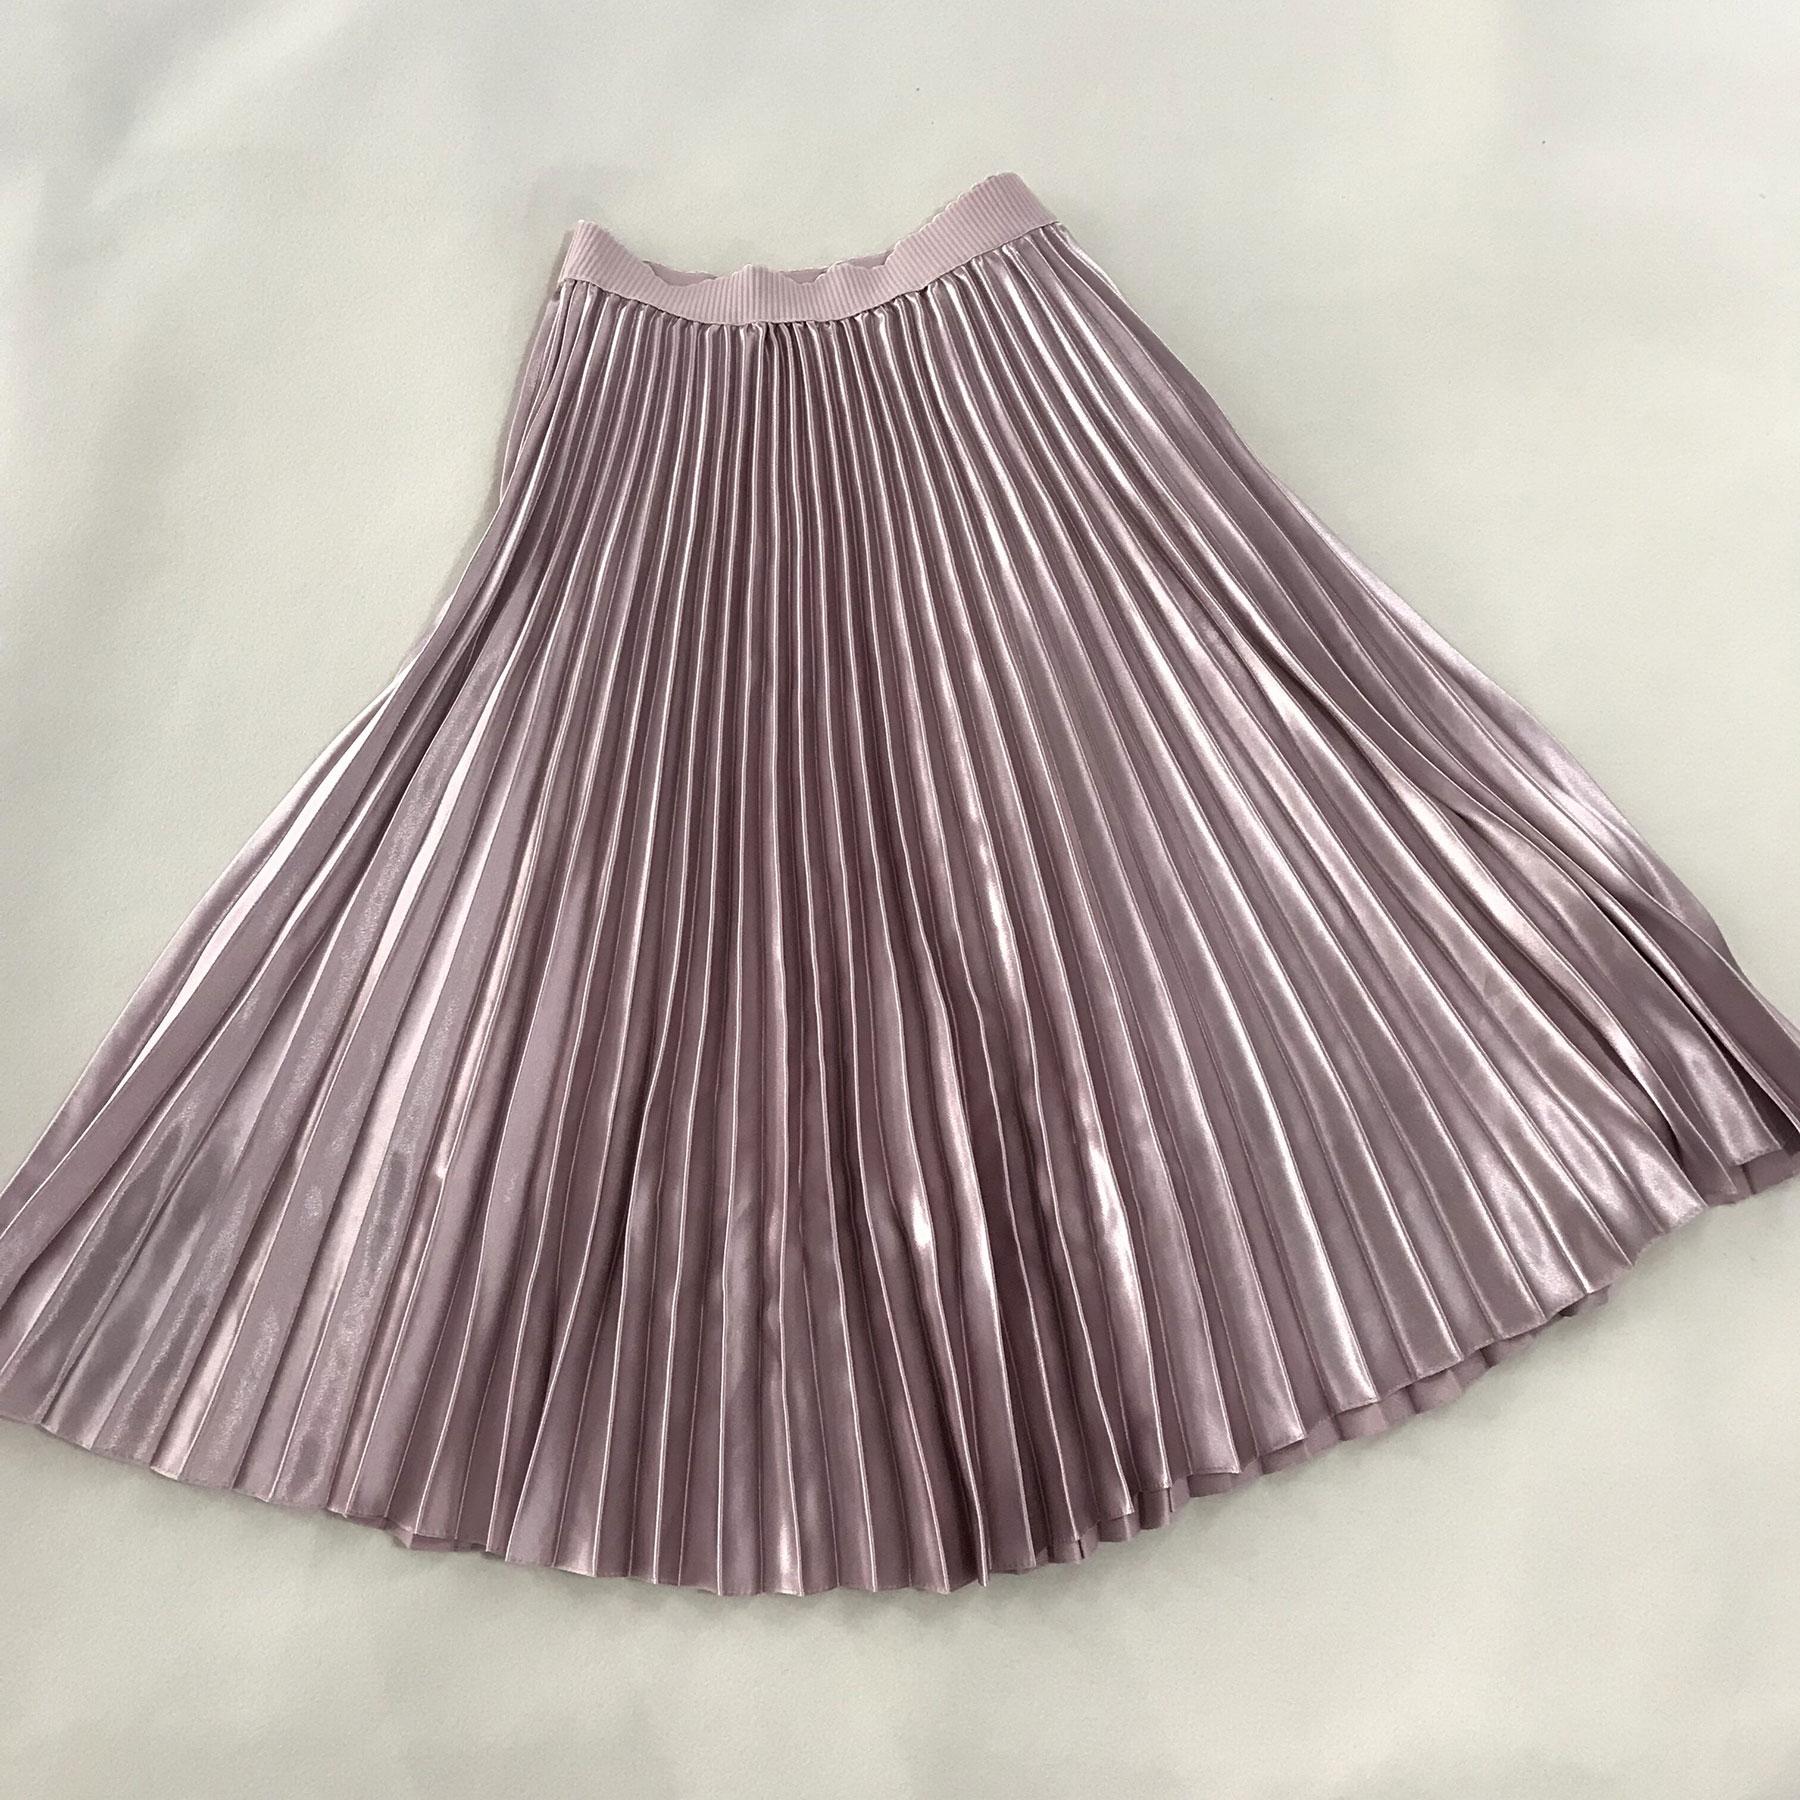 Sherhure 2018 Spring Women Long Skirts Fashion Brand A-Line Women Pleated Skirts High Waist Women Midi Skirt Faldas Mujer Saias 4